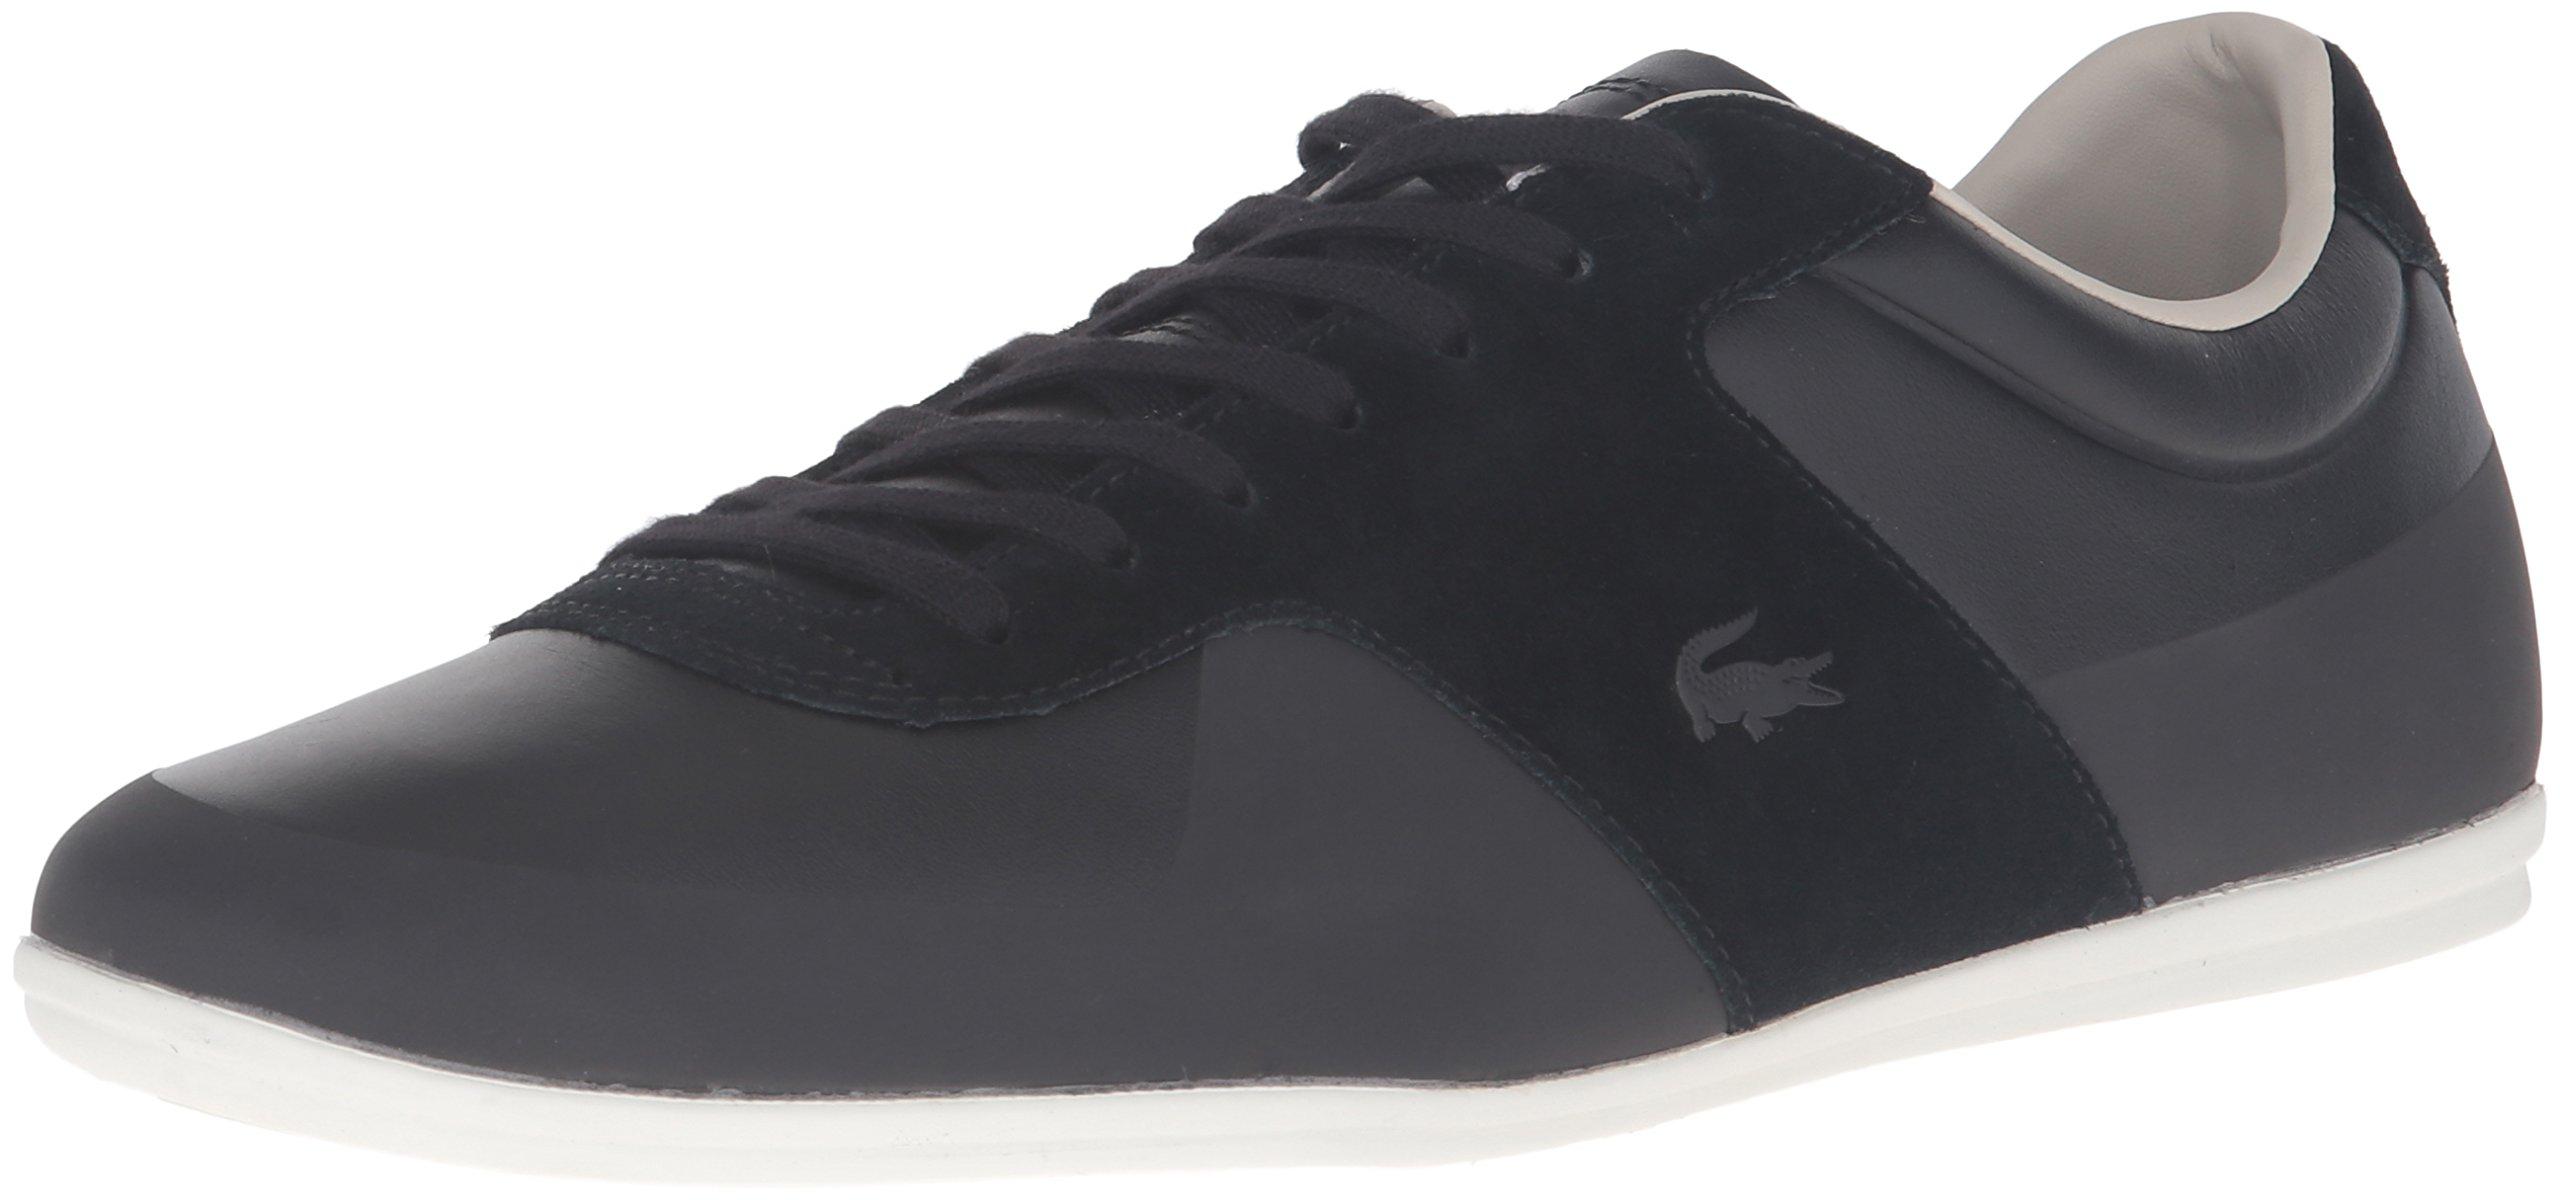 Lacoste Men's Turnier 316 1 Cam Fashion Sneaker, Black, 9.5 M US